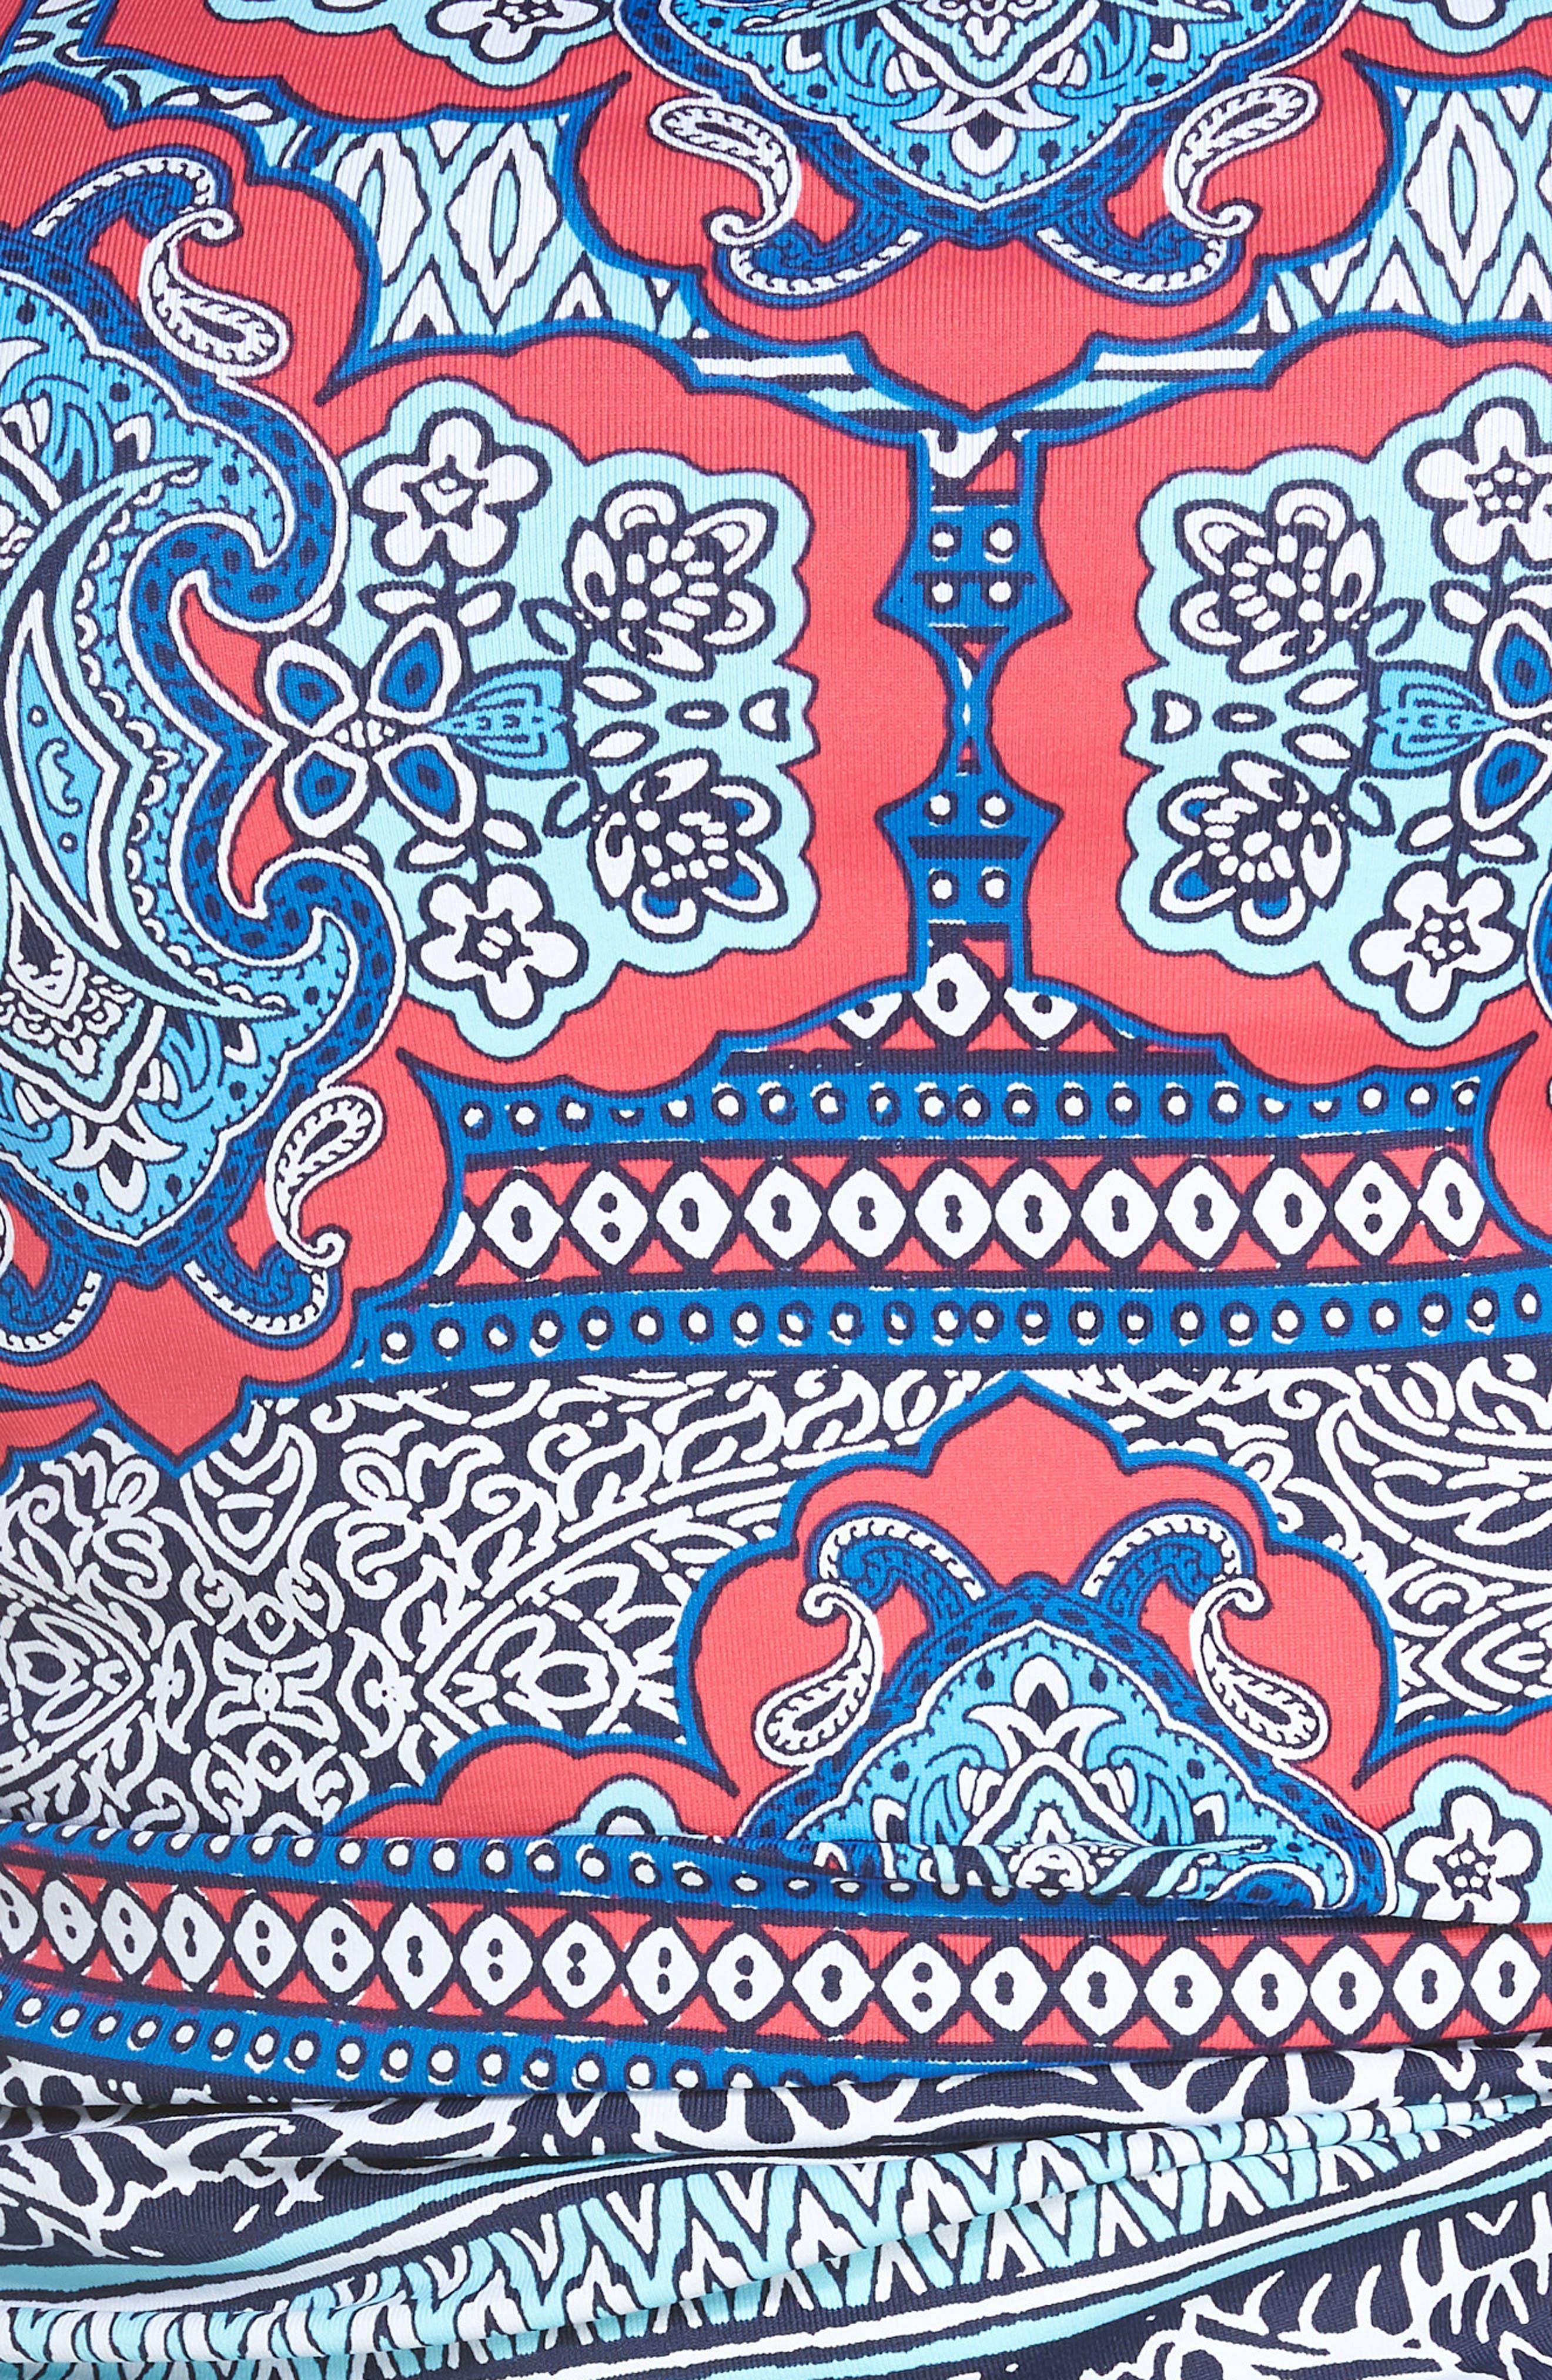 TOMMY BAHAMA,                             Riviera Tiles Strapless Tankini Top,                             Alternate thumbnail 5, color,                             650